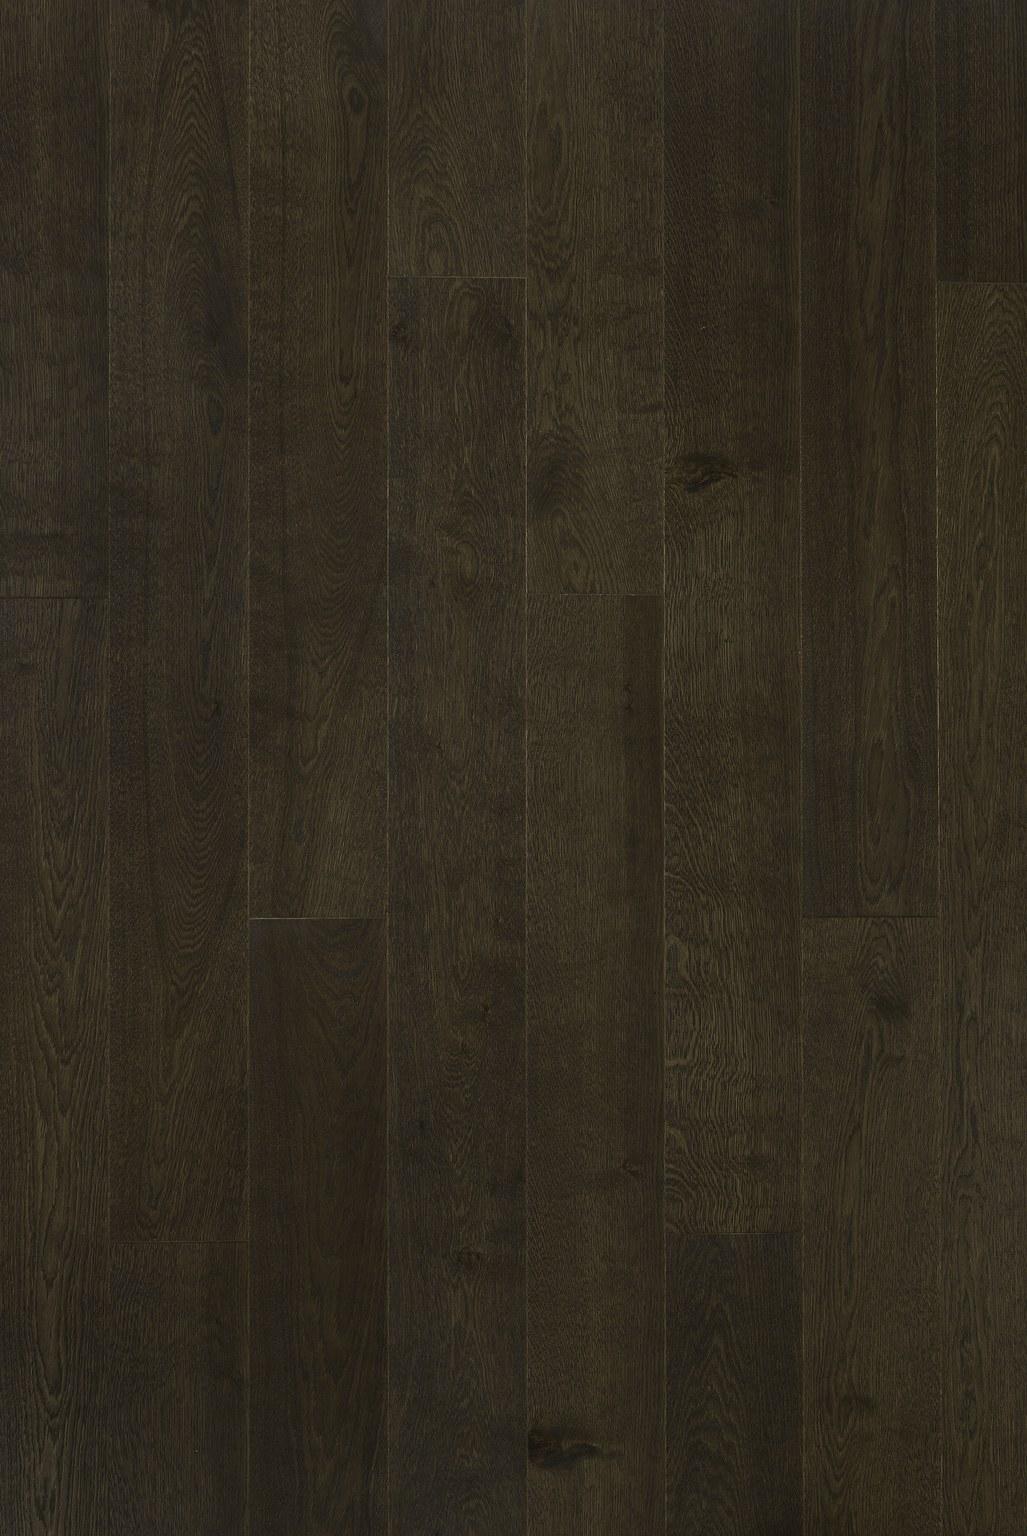 Timberwise parketti lankkuparketti puulattia wooden floor parquet plank Tammi Oak Choco 2D1